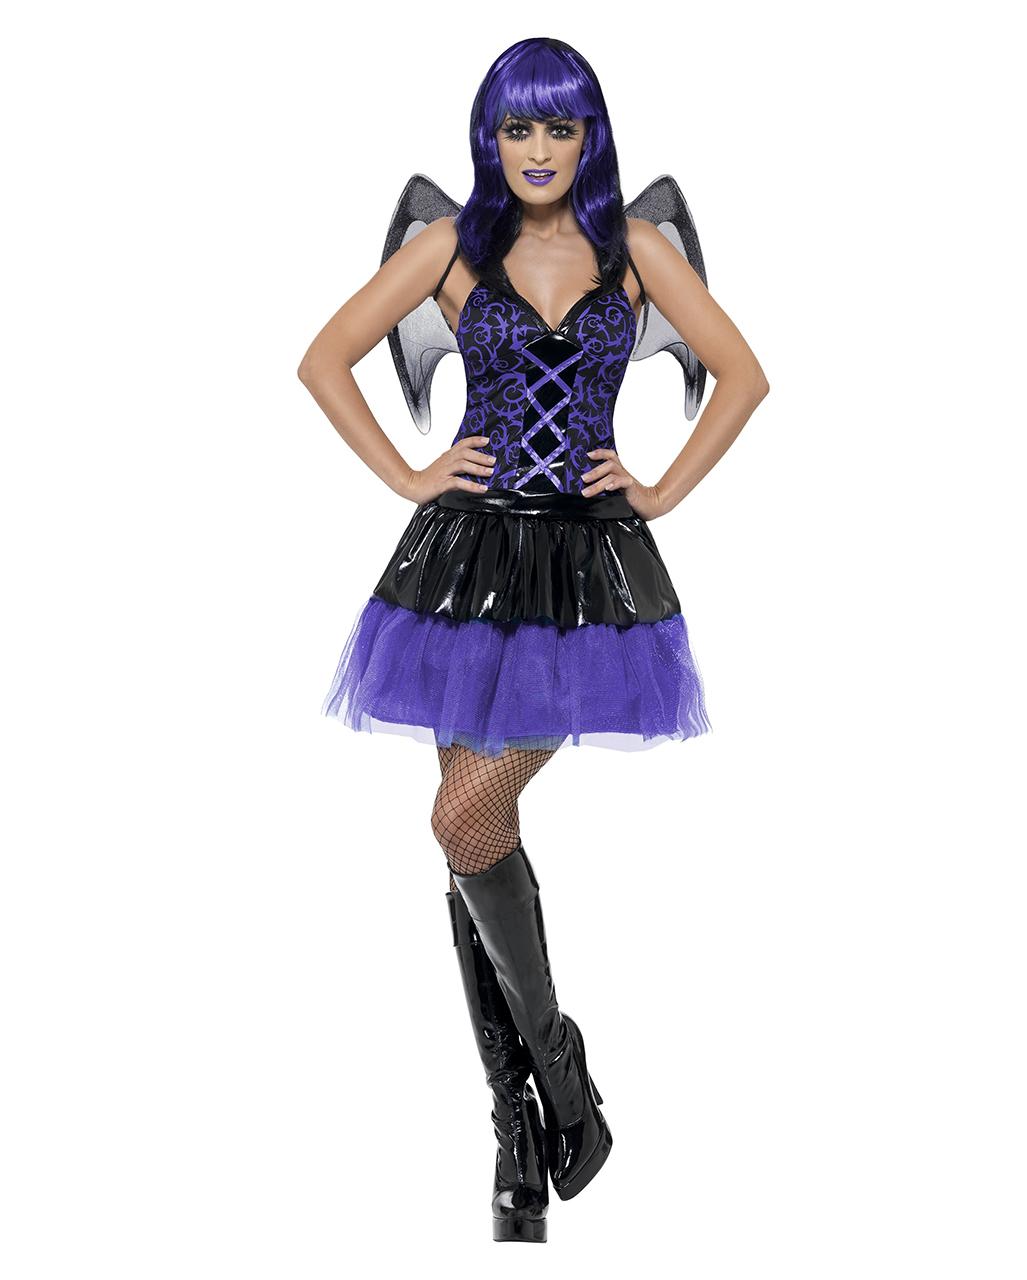 Verruchter Engel Damen Kostum Fur Halloween Karneval Universe